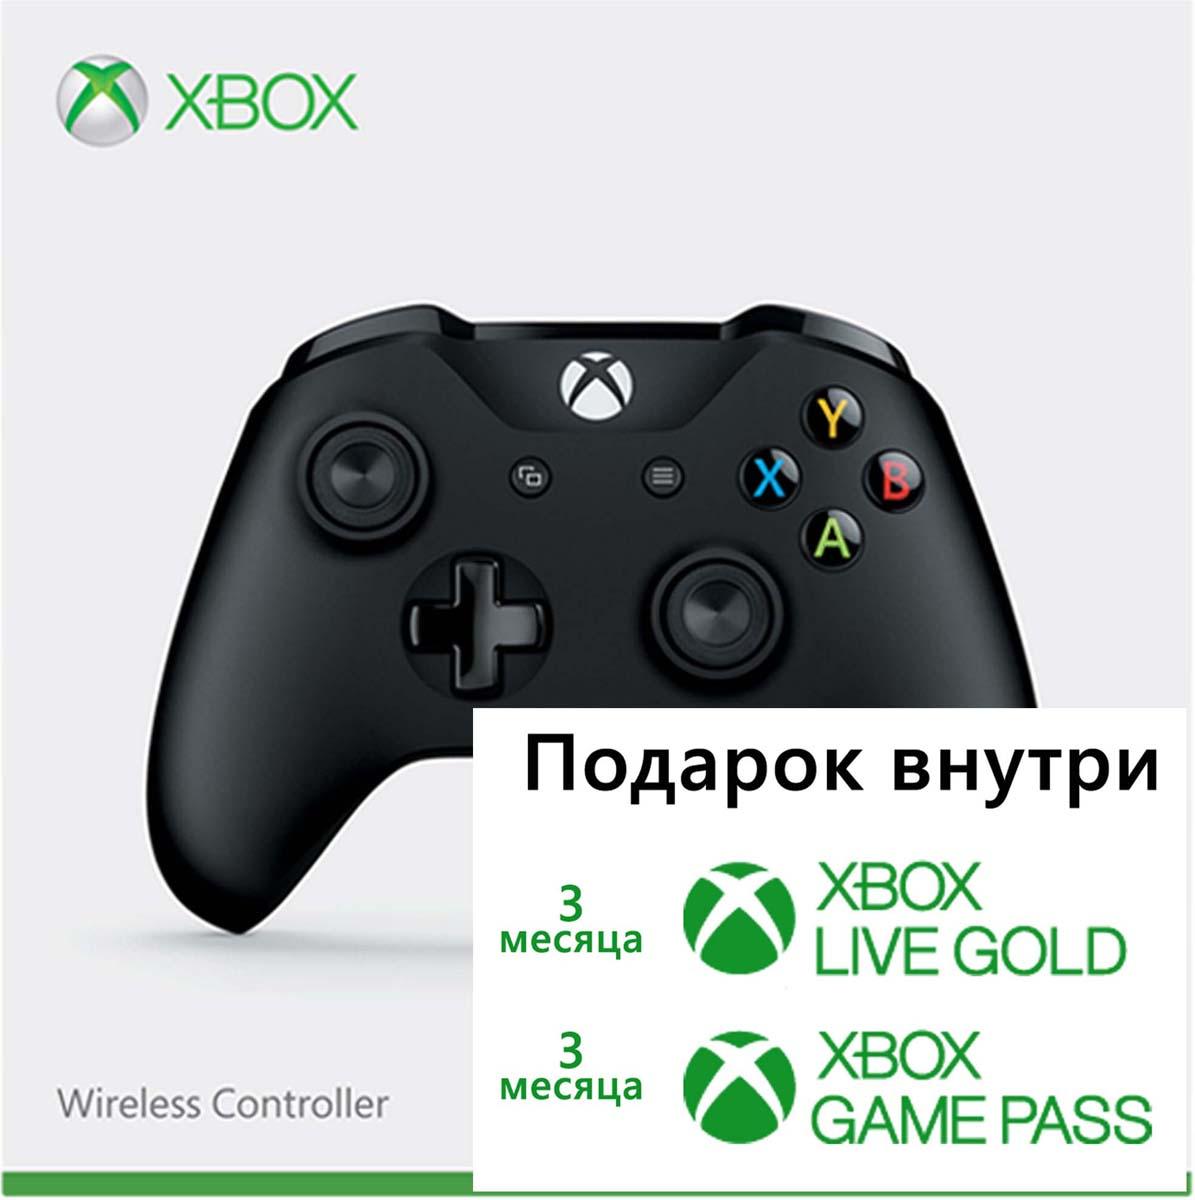 Геймпад беспроводной Microsoft Xbox One + 3м Xbox Live, 3м Game Pass, 41838, черный зарядная станция с 2 я аккумуляторами black horns для геймпадов xbox one